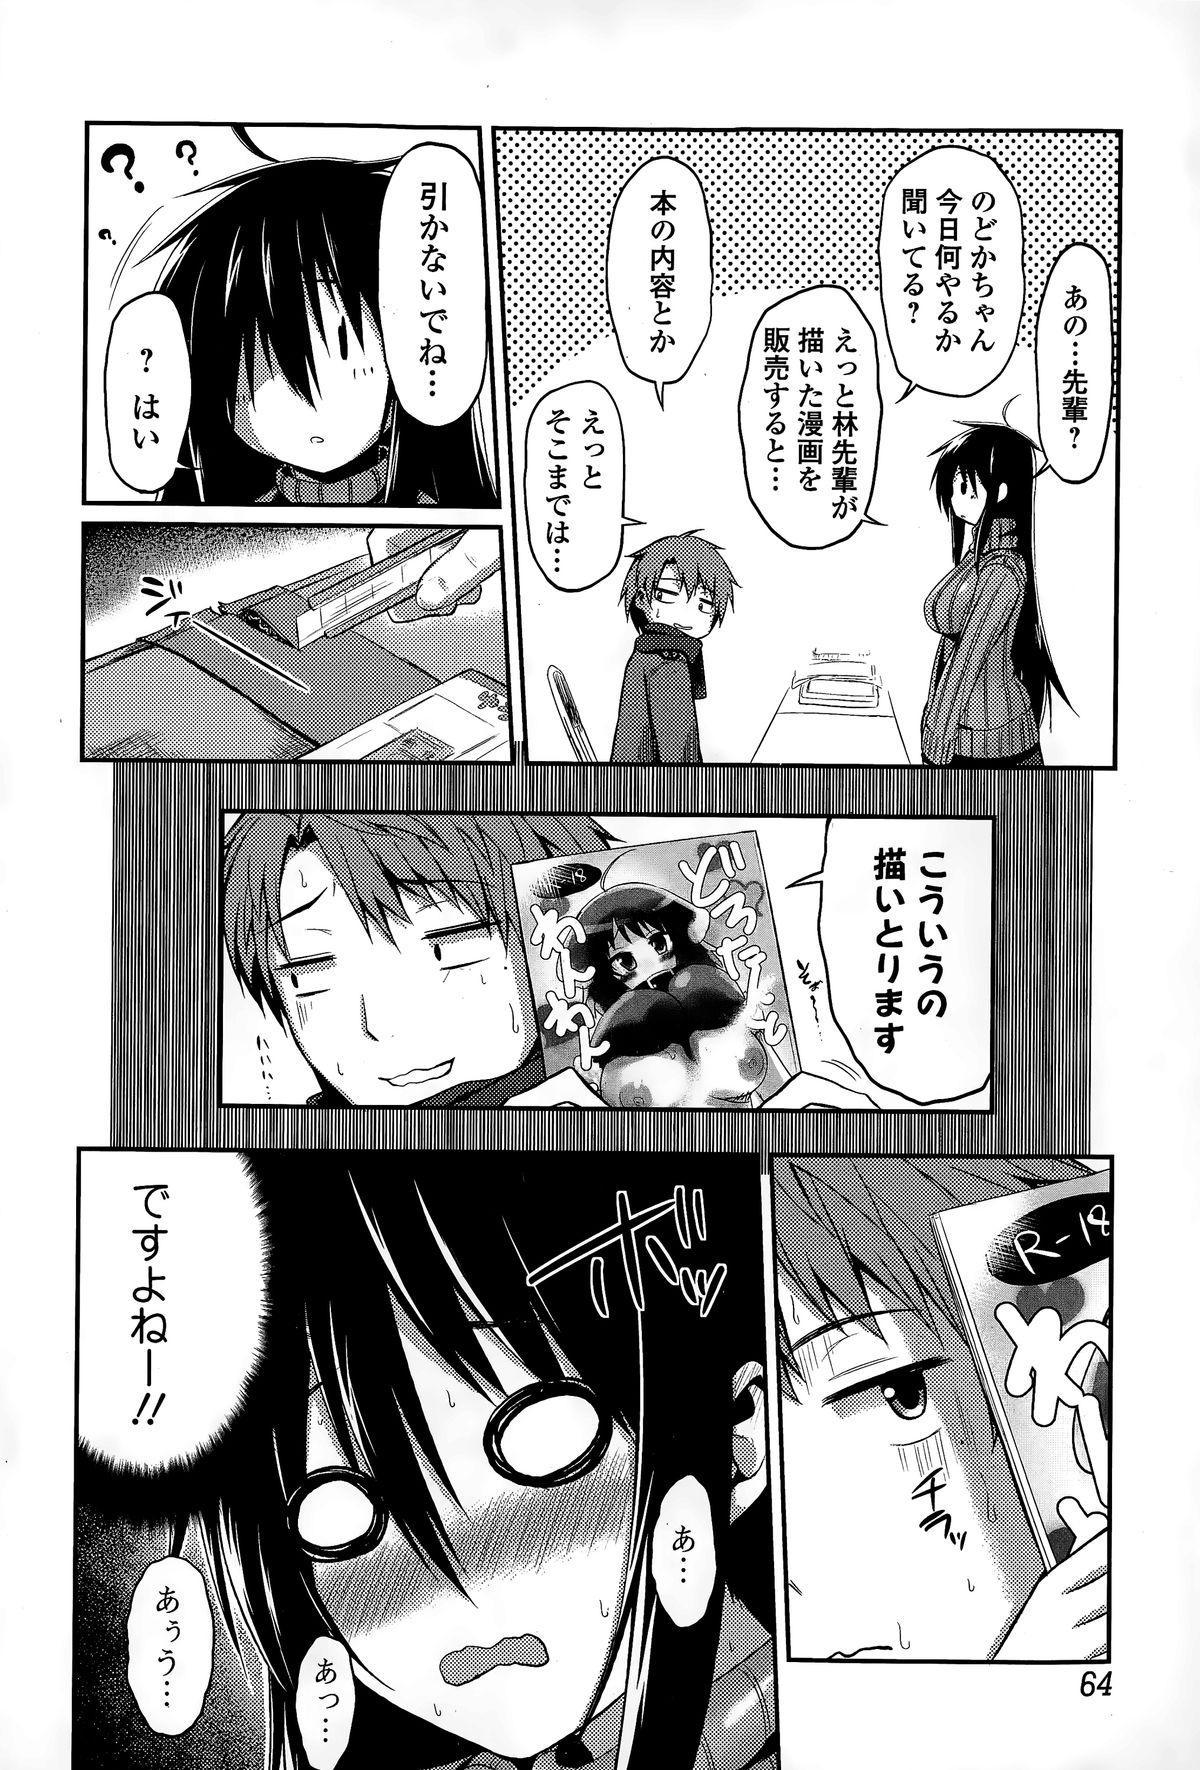 Comic Toutetsu 2015-02 Vol. 3 63